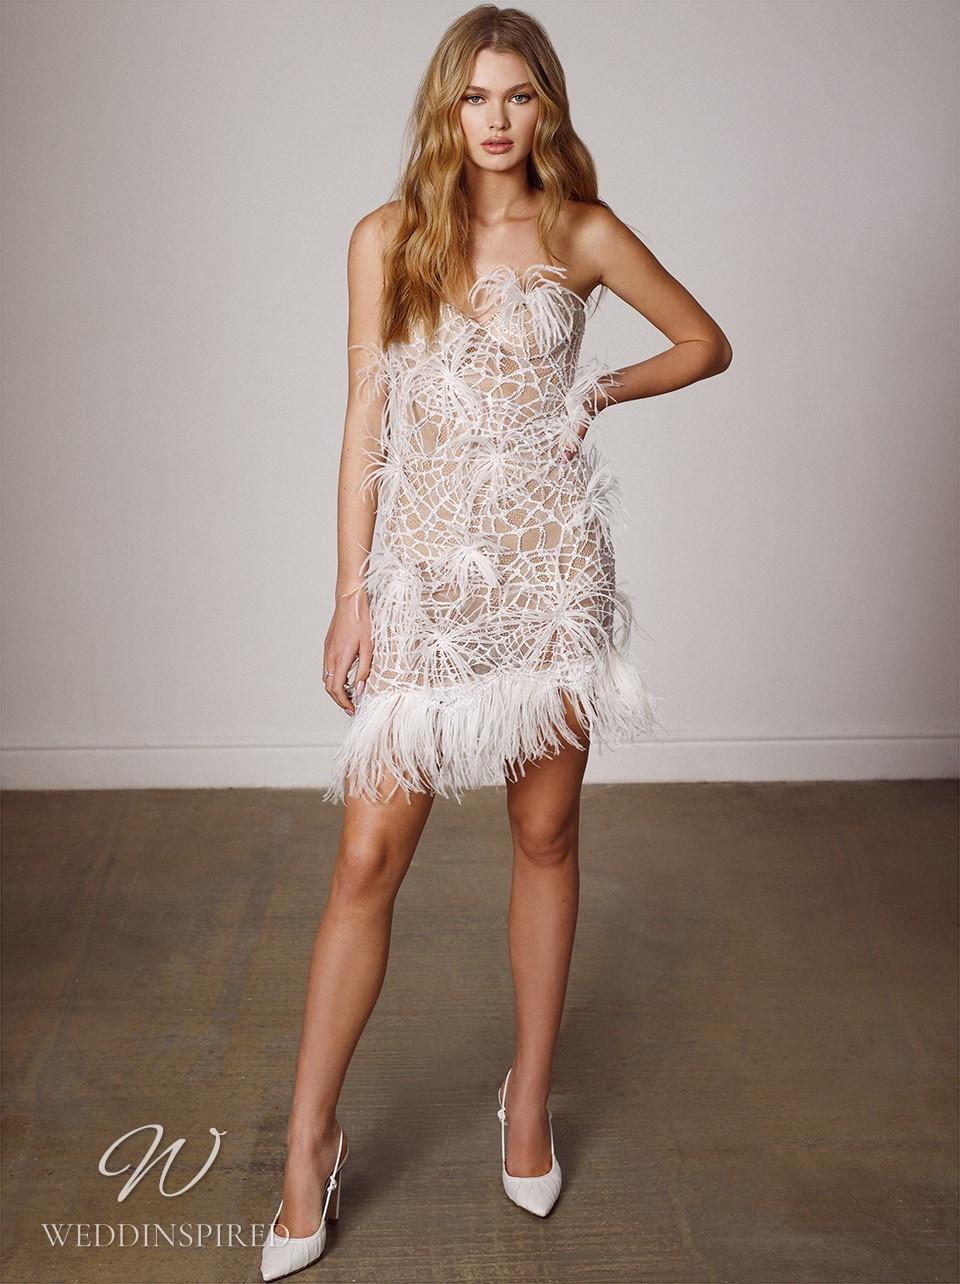 A Galia Lahav 2022 strapless nude short wedding dress with feathers and fringe